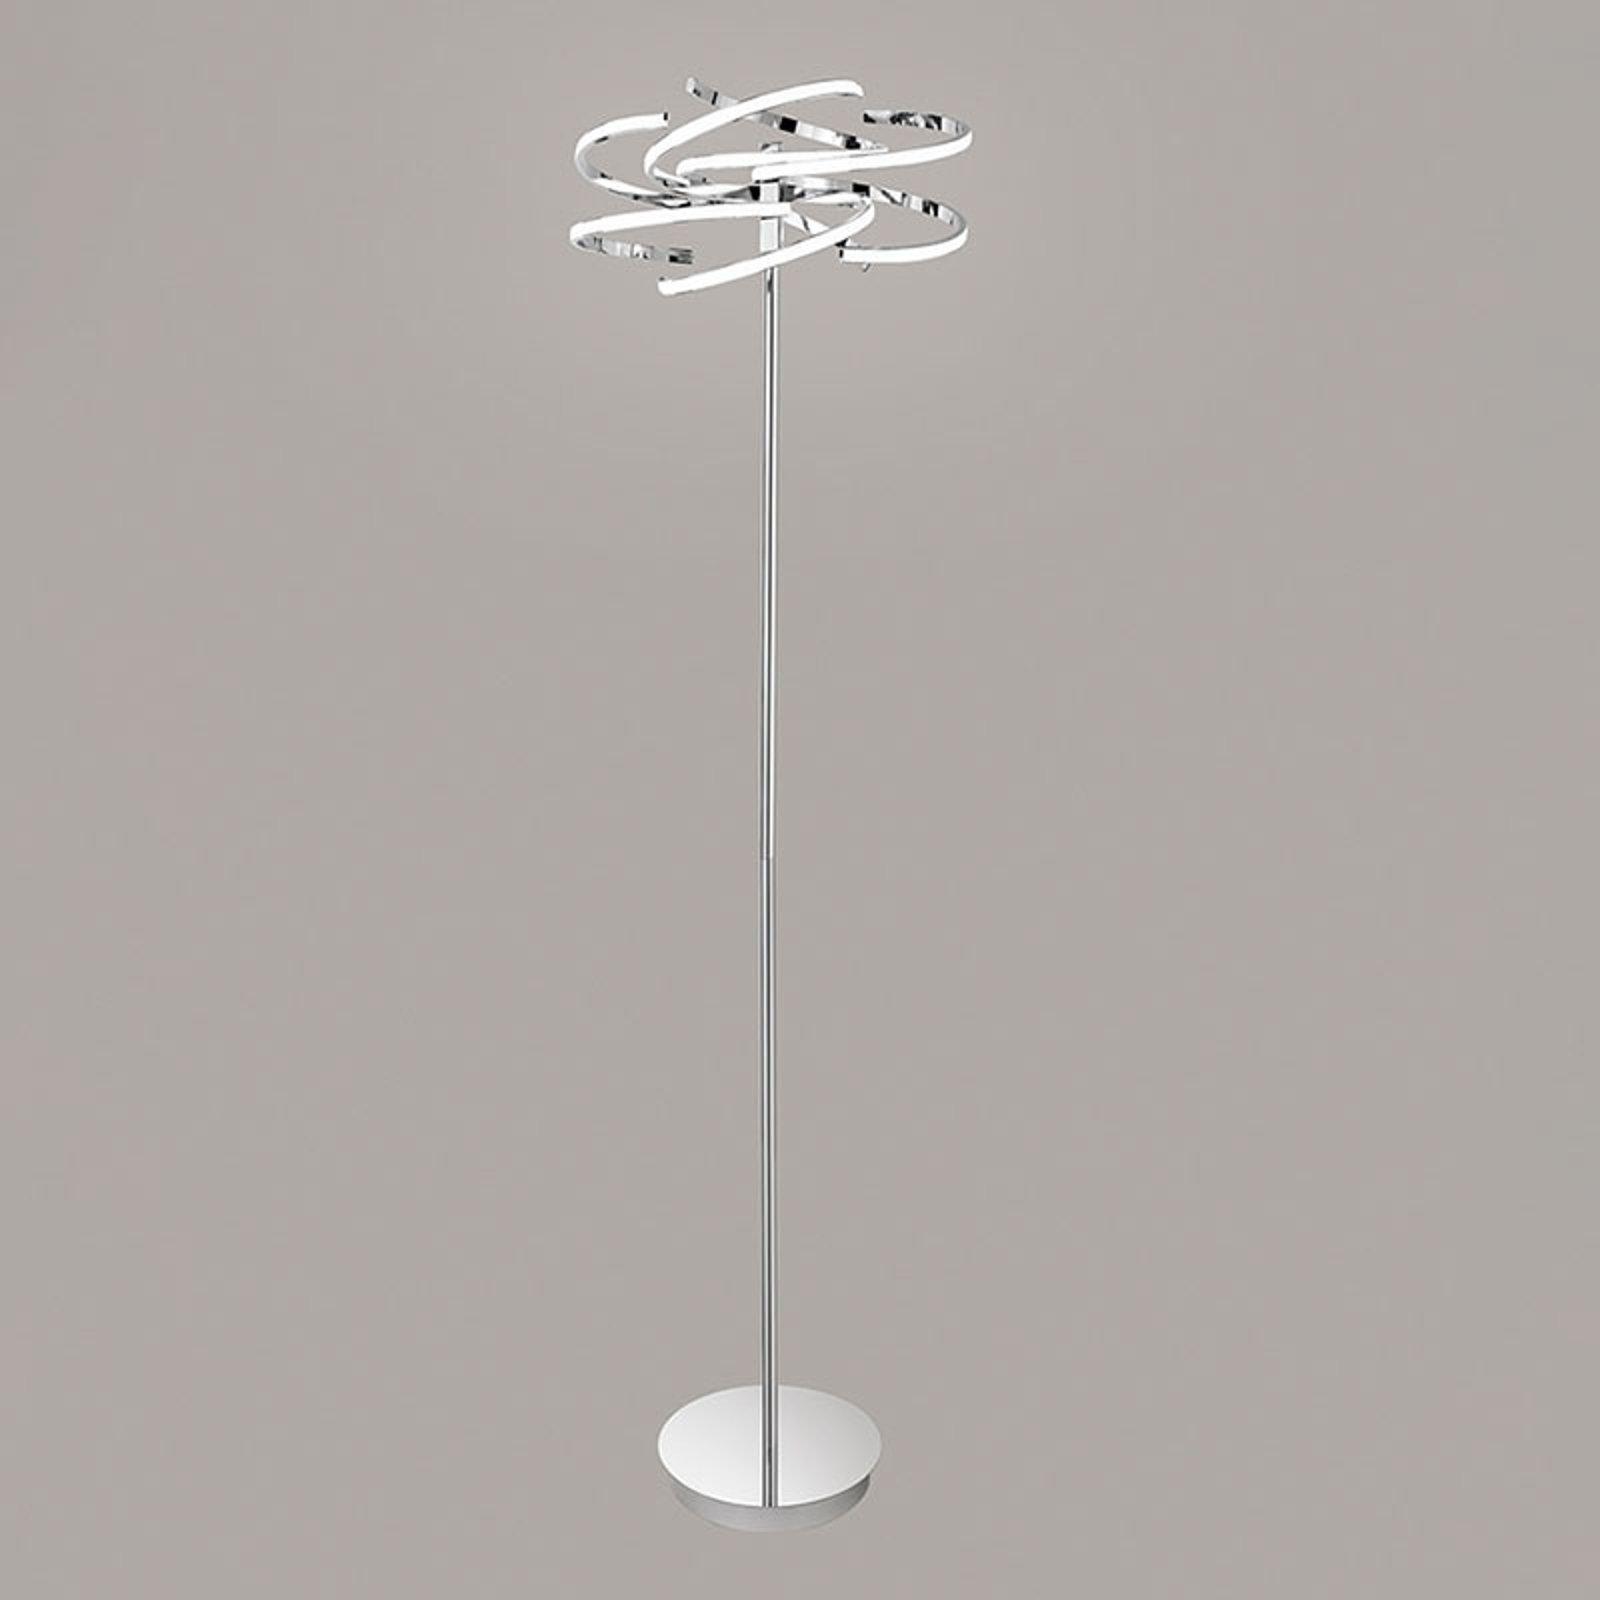 LED-gulvlampe 6399 krom